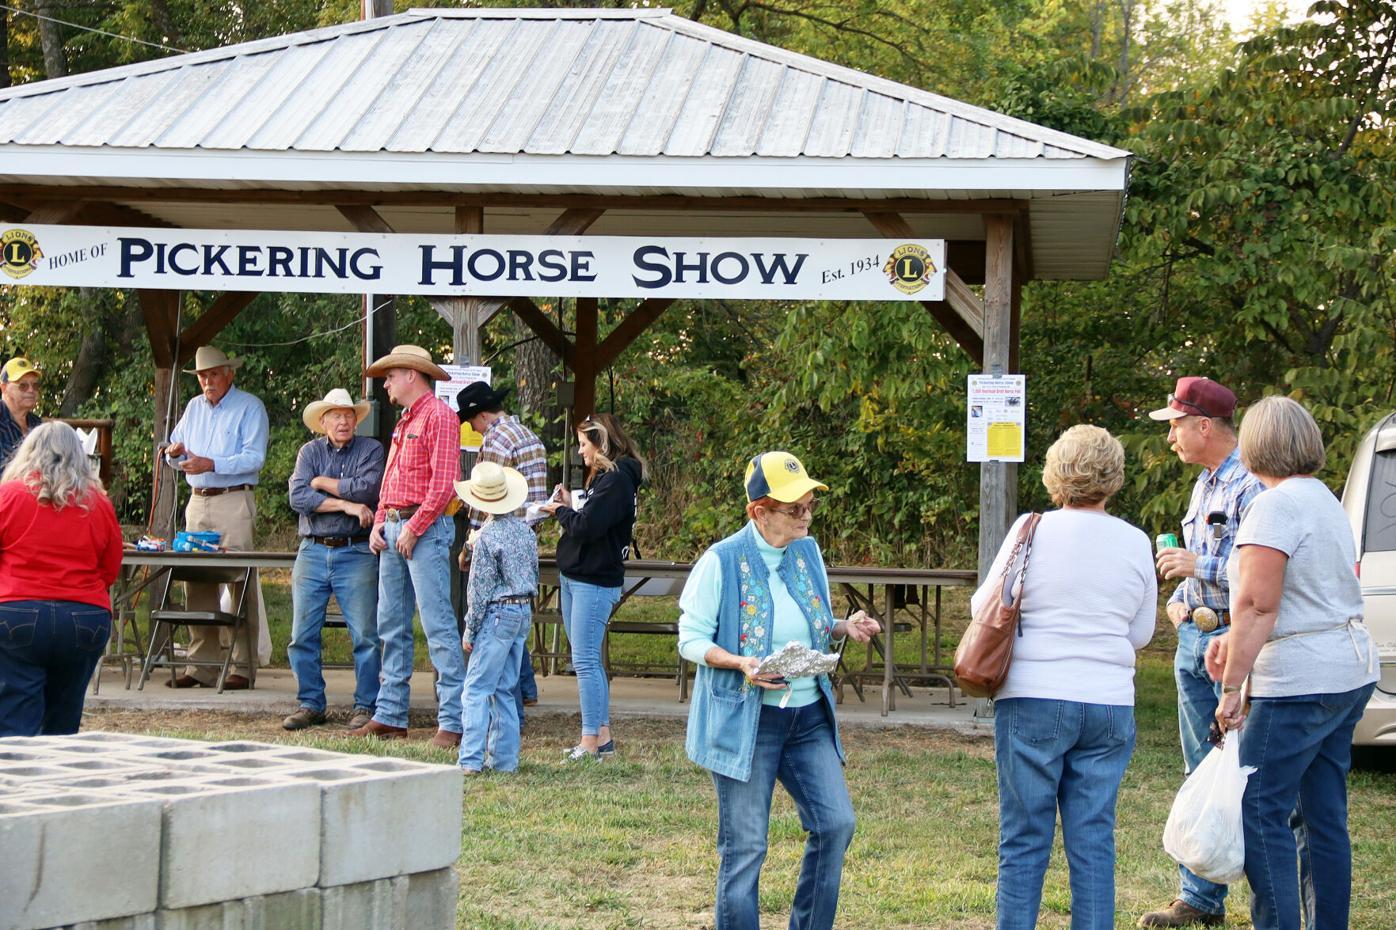 9-9-21 Pickering Horse Show 1.jpg